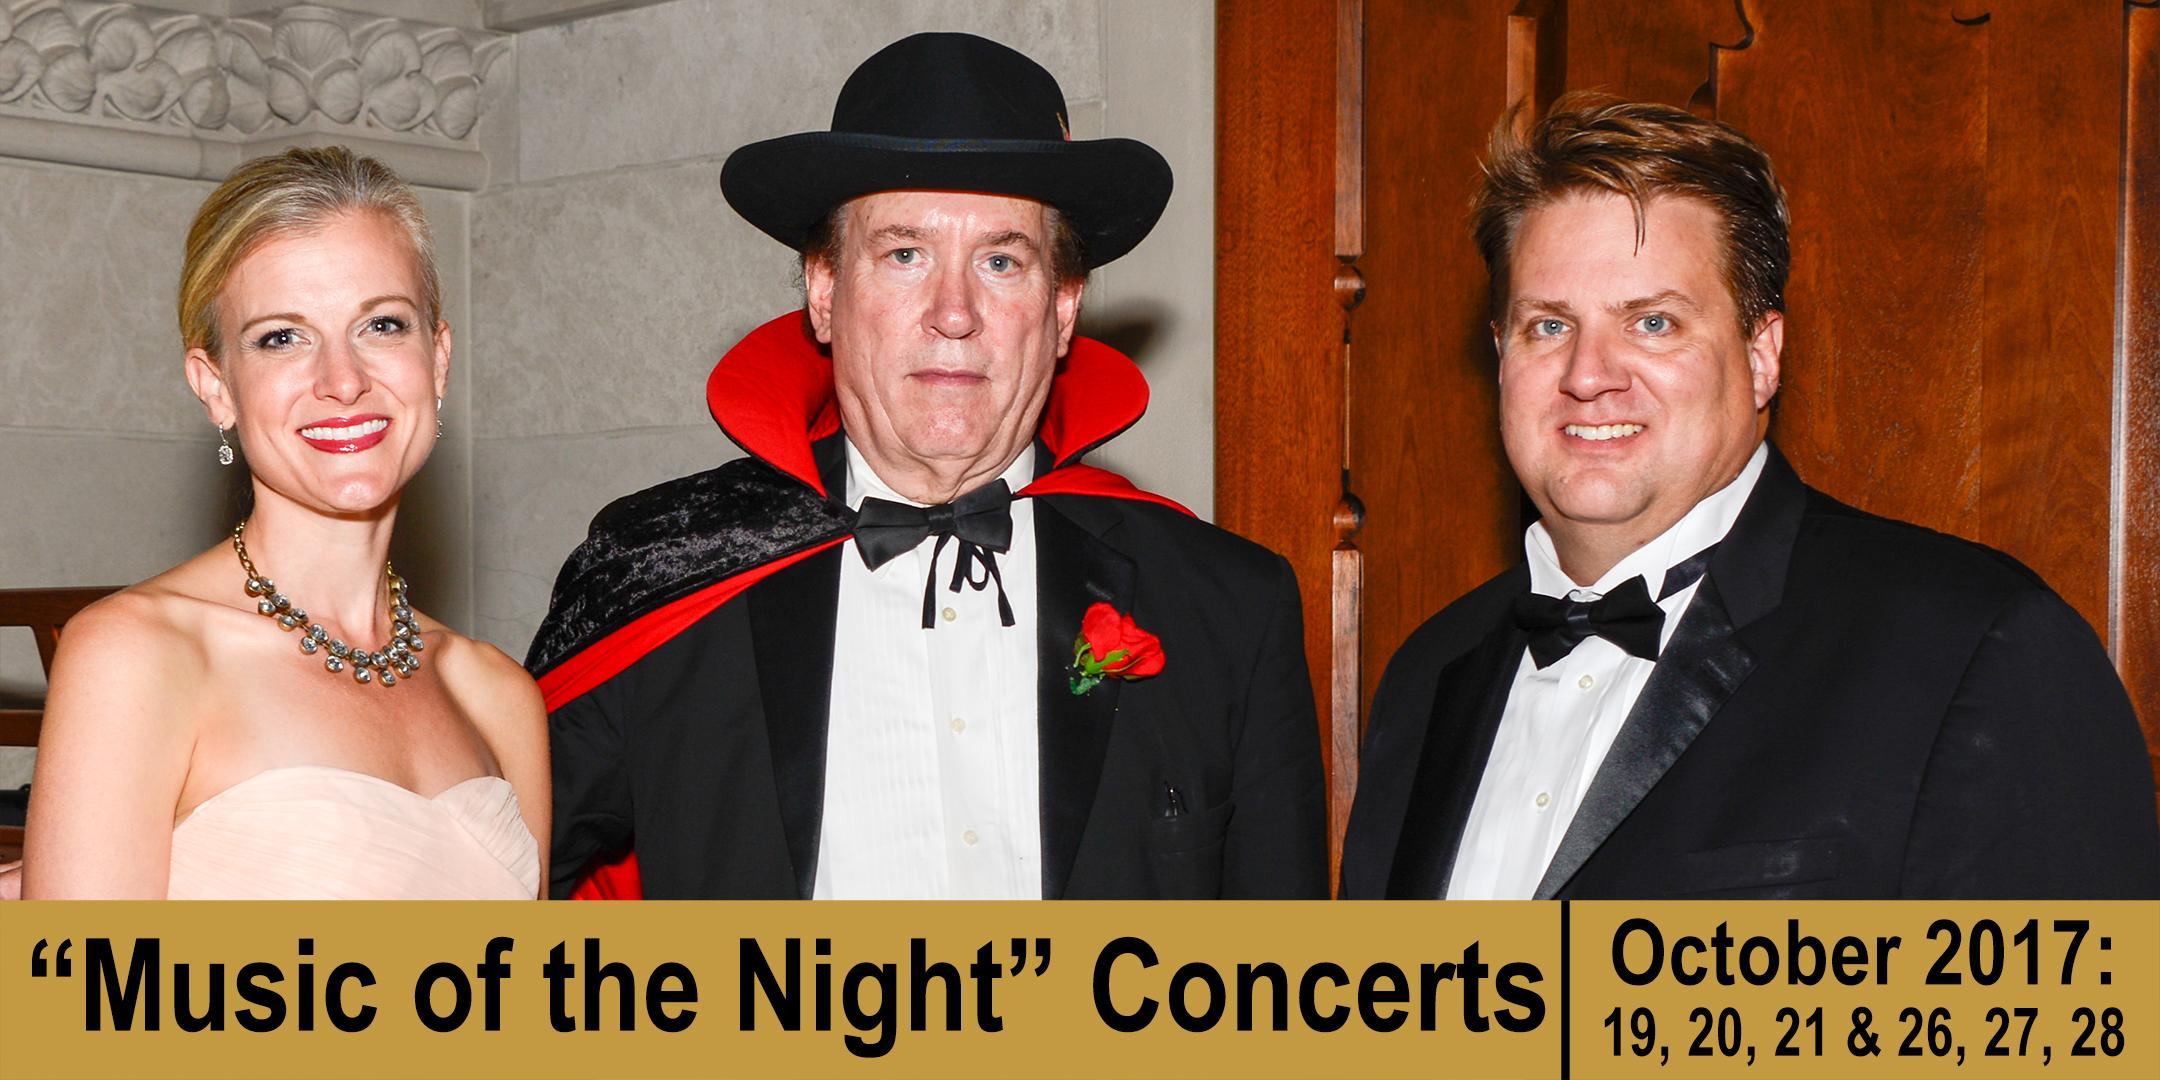 """Music of the Night"" Concert (THURSDAY, 10/19/17)"